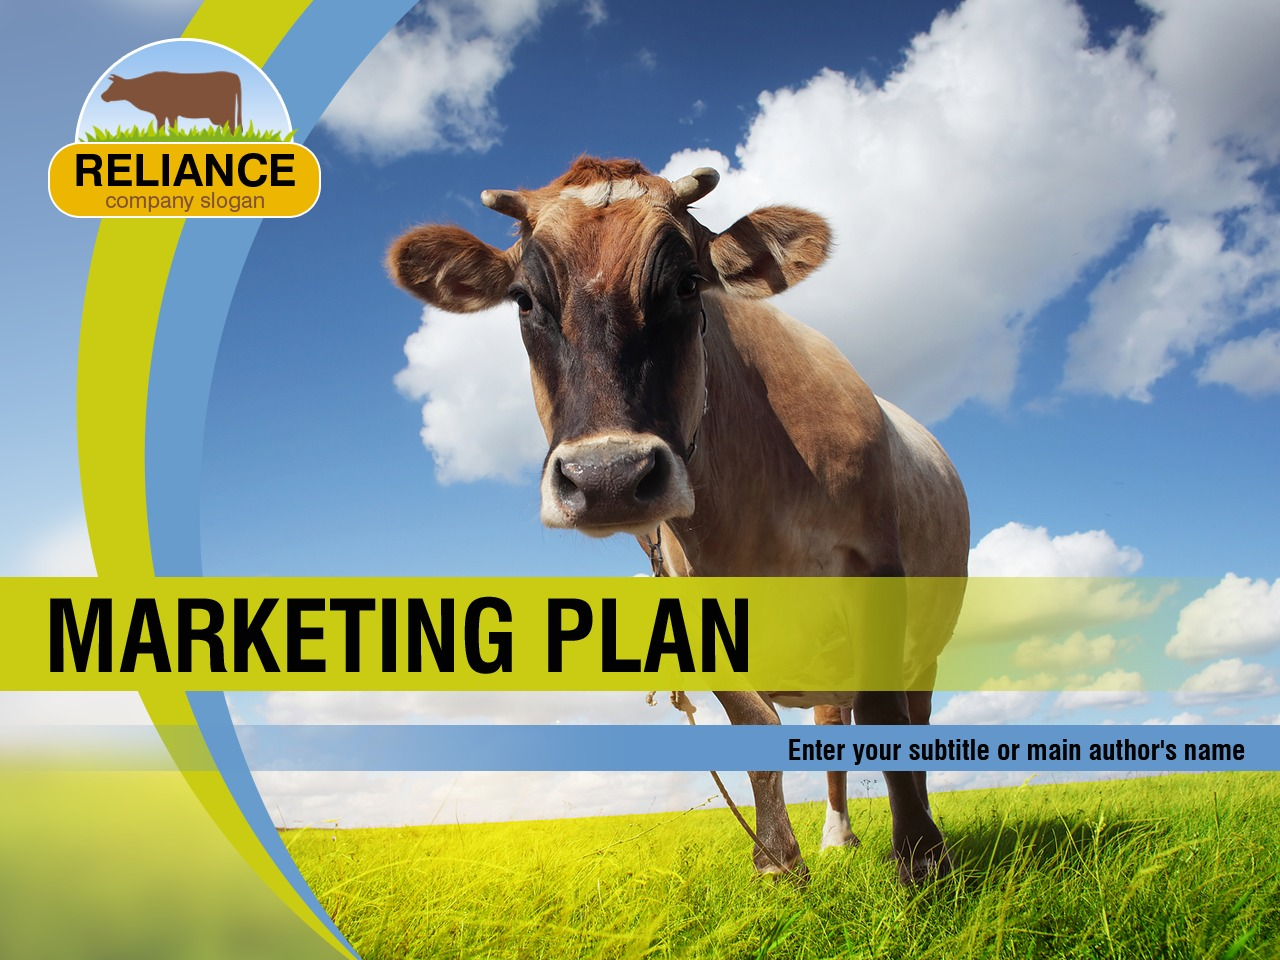 PowerPoint шаблон №36683 на тему скотоводчество